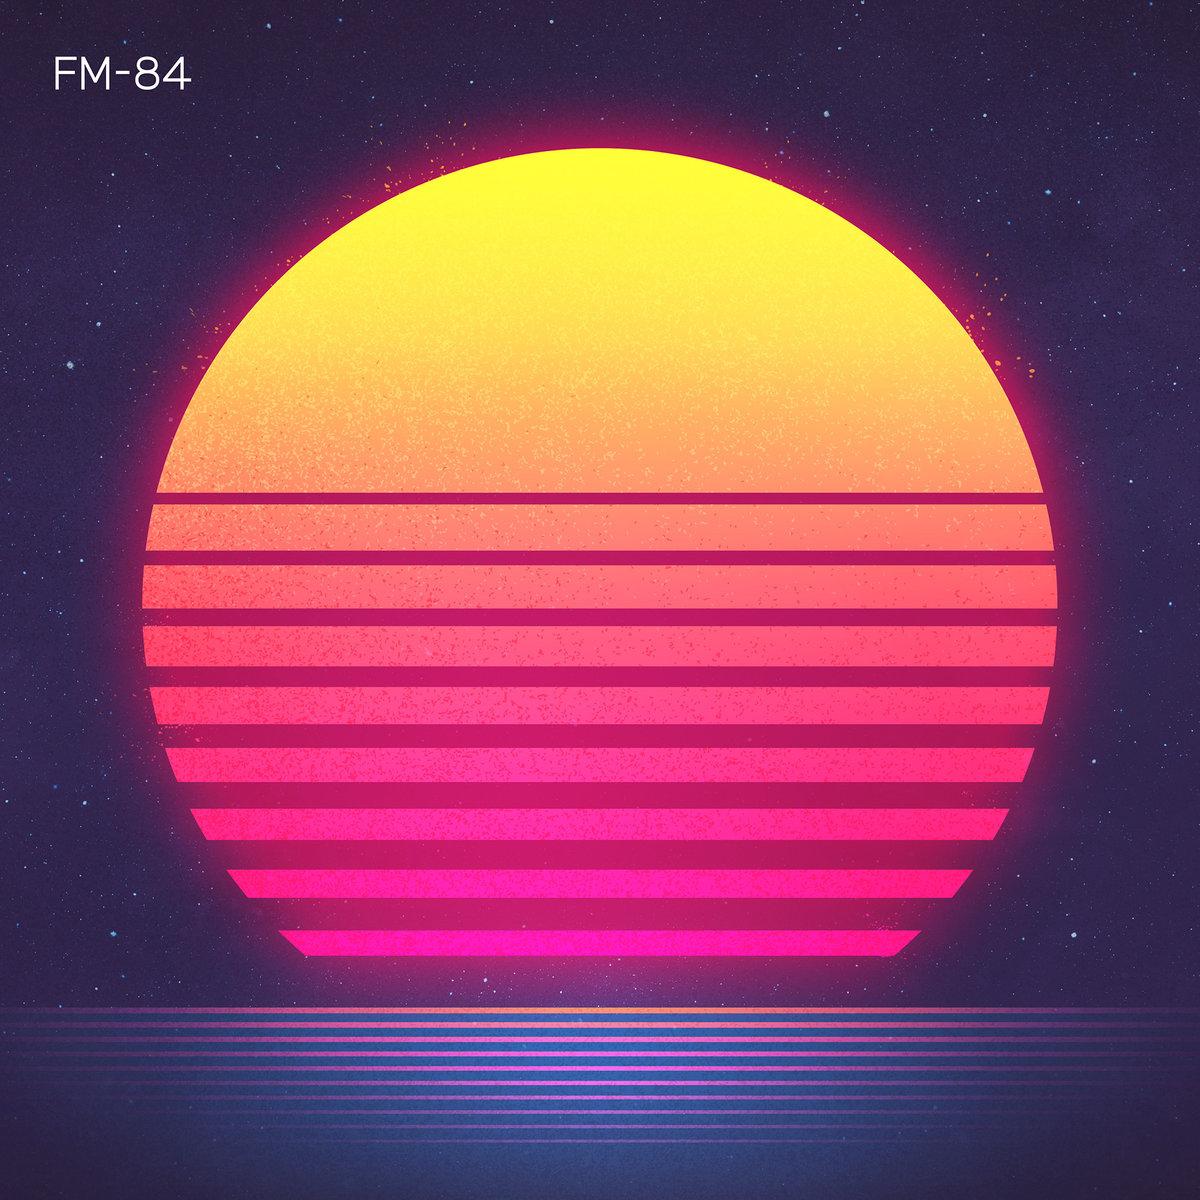 FM-84_05.jpg